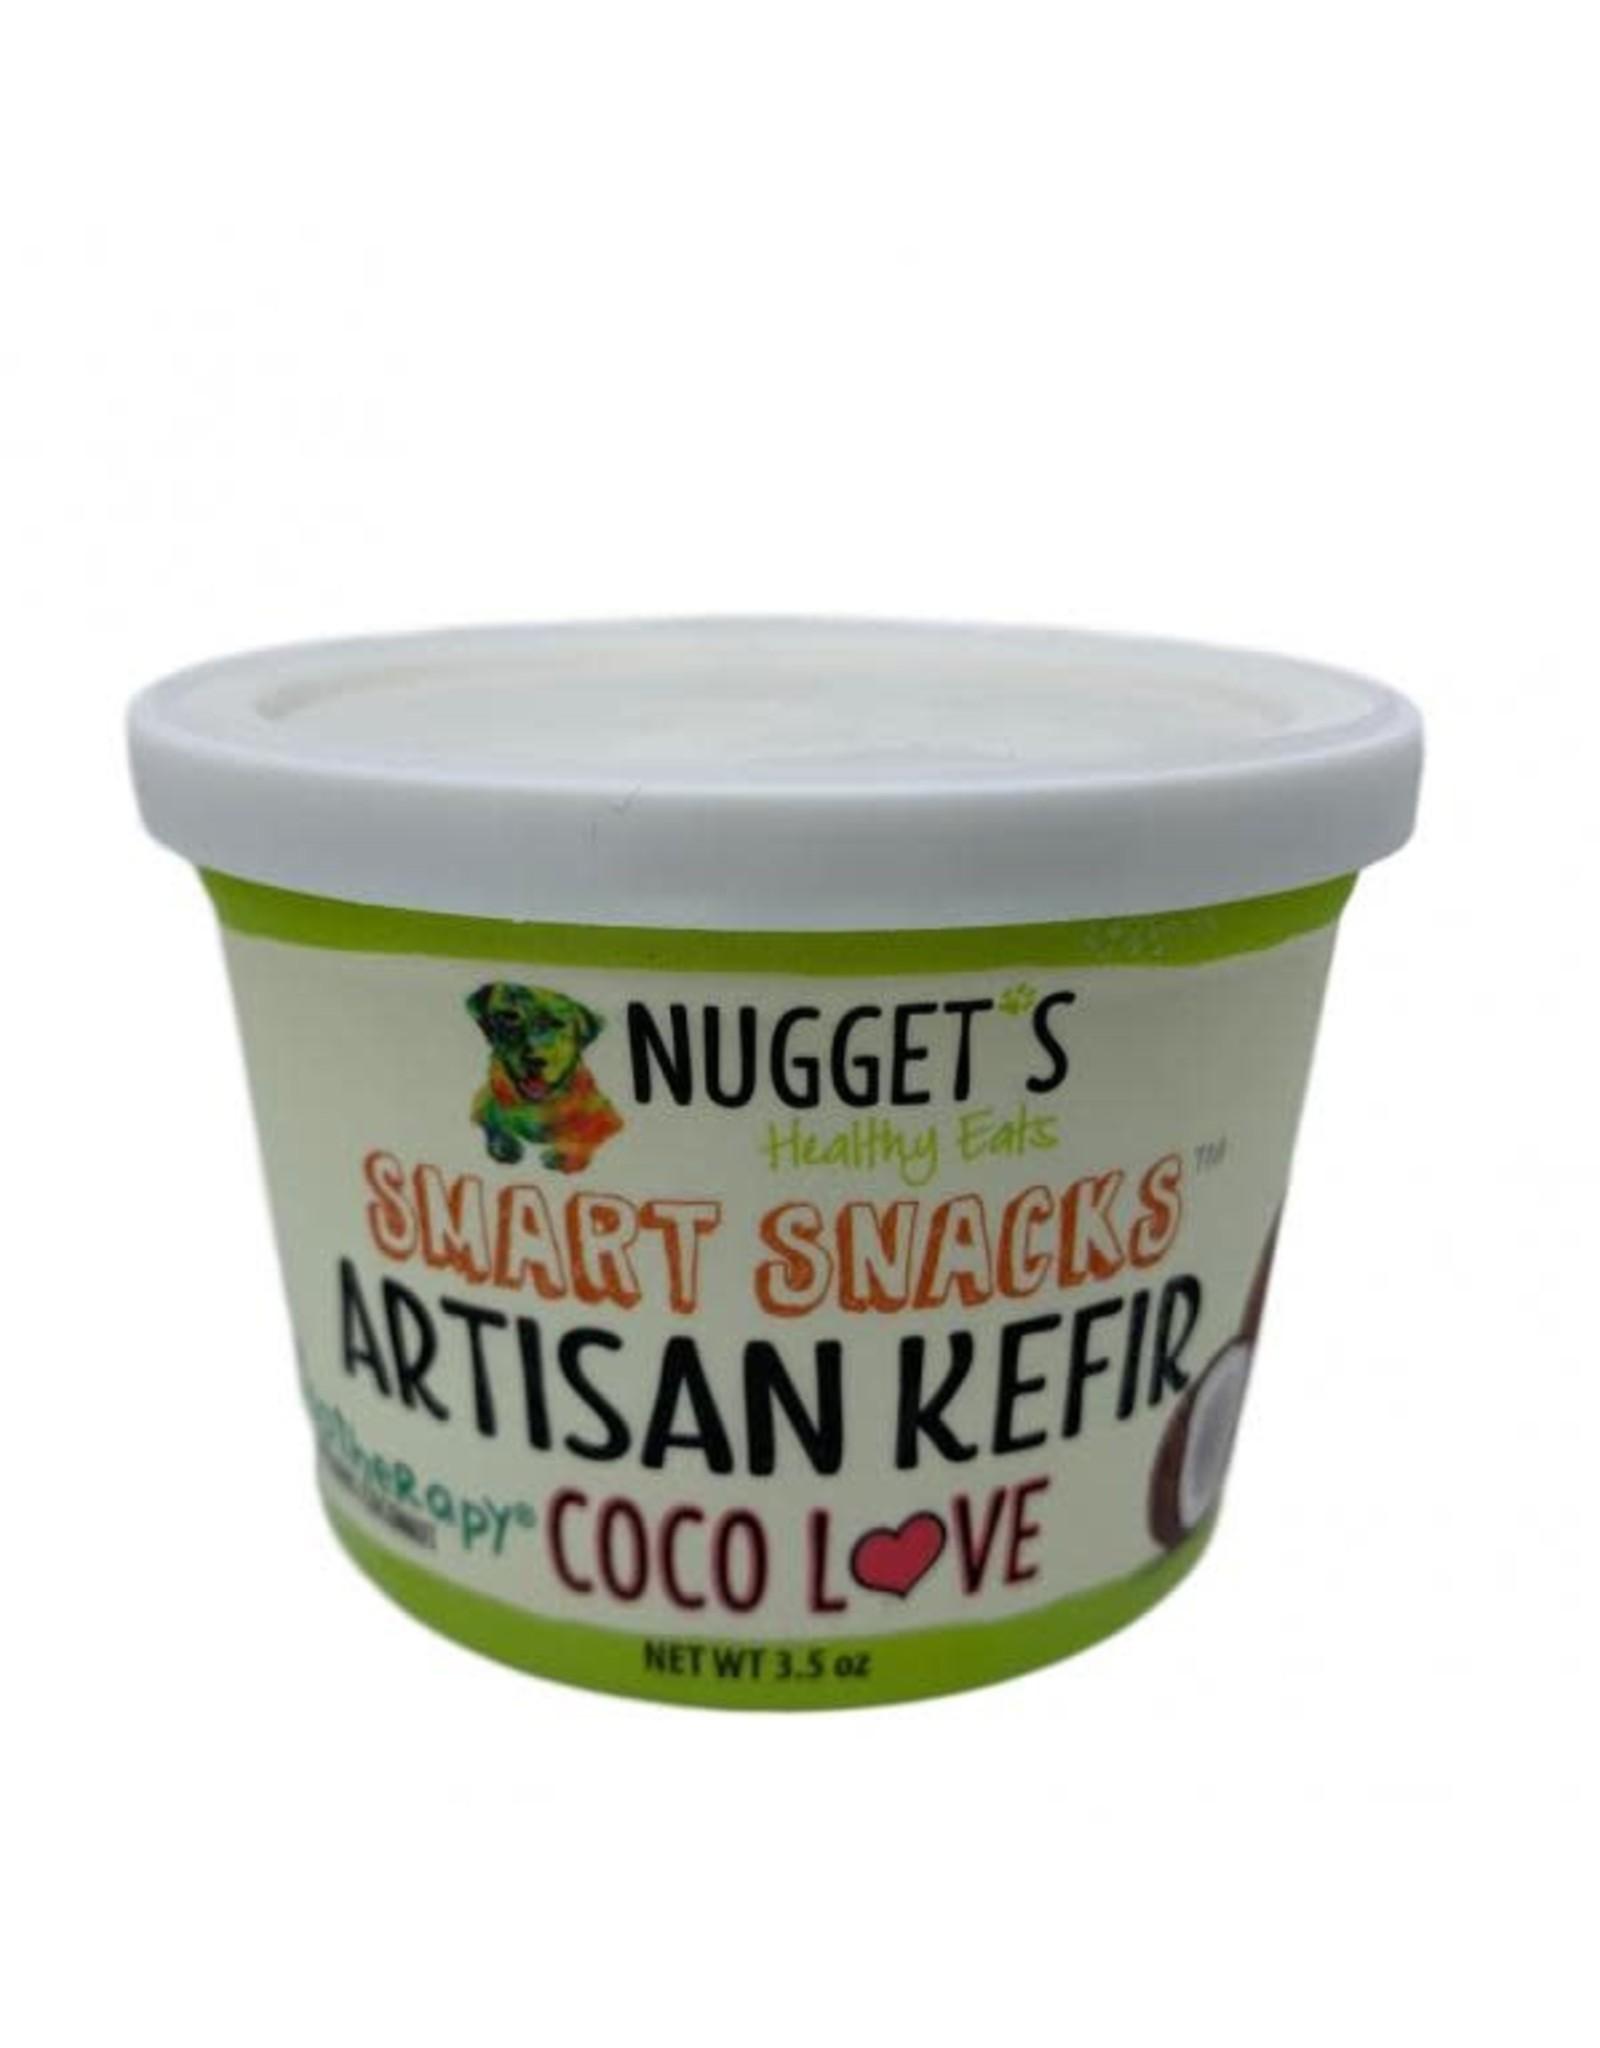 NUGGET'S HEALTHY EATS NUGGETS DOG/ CAT FROZEN SMART SNACK KEFIR COCO LOVE 3.5OZ CASE